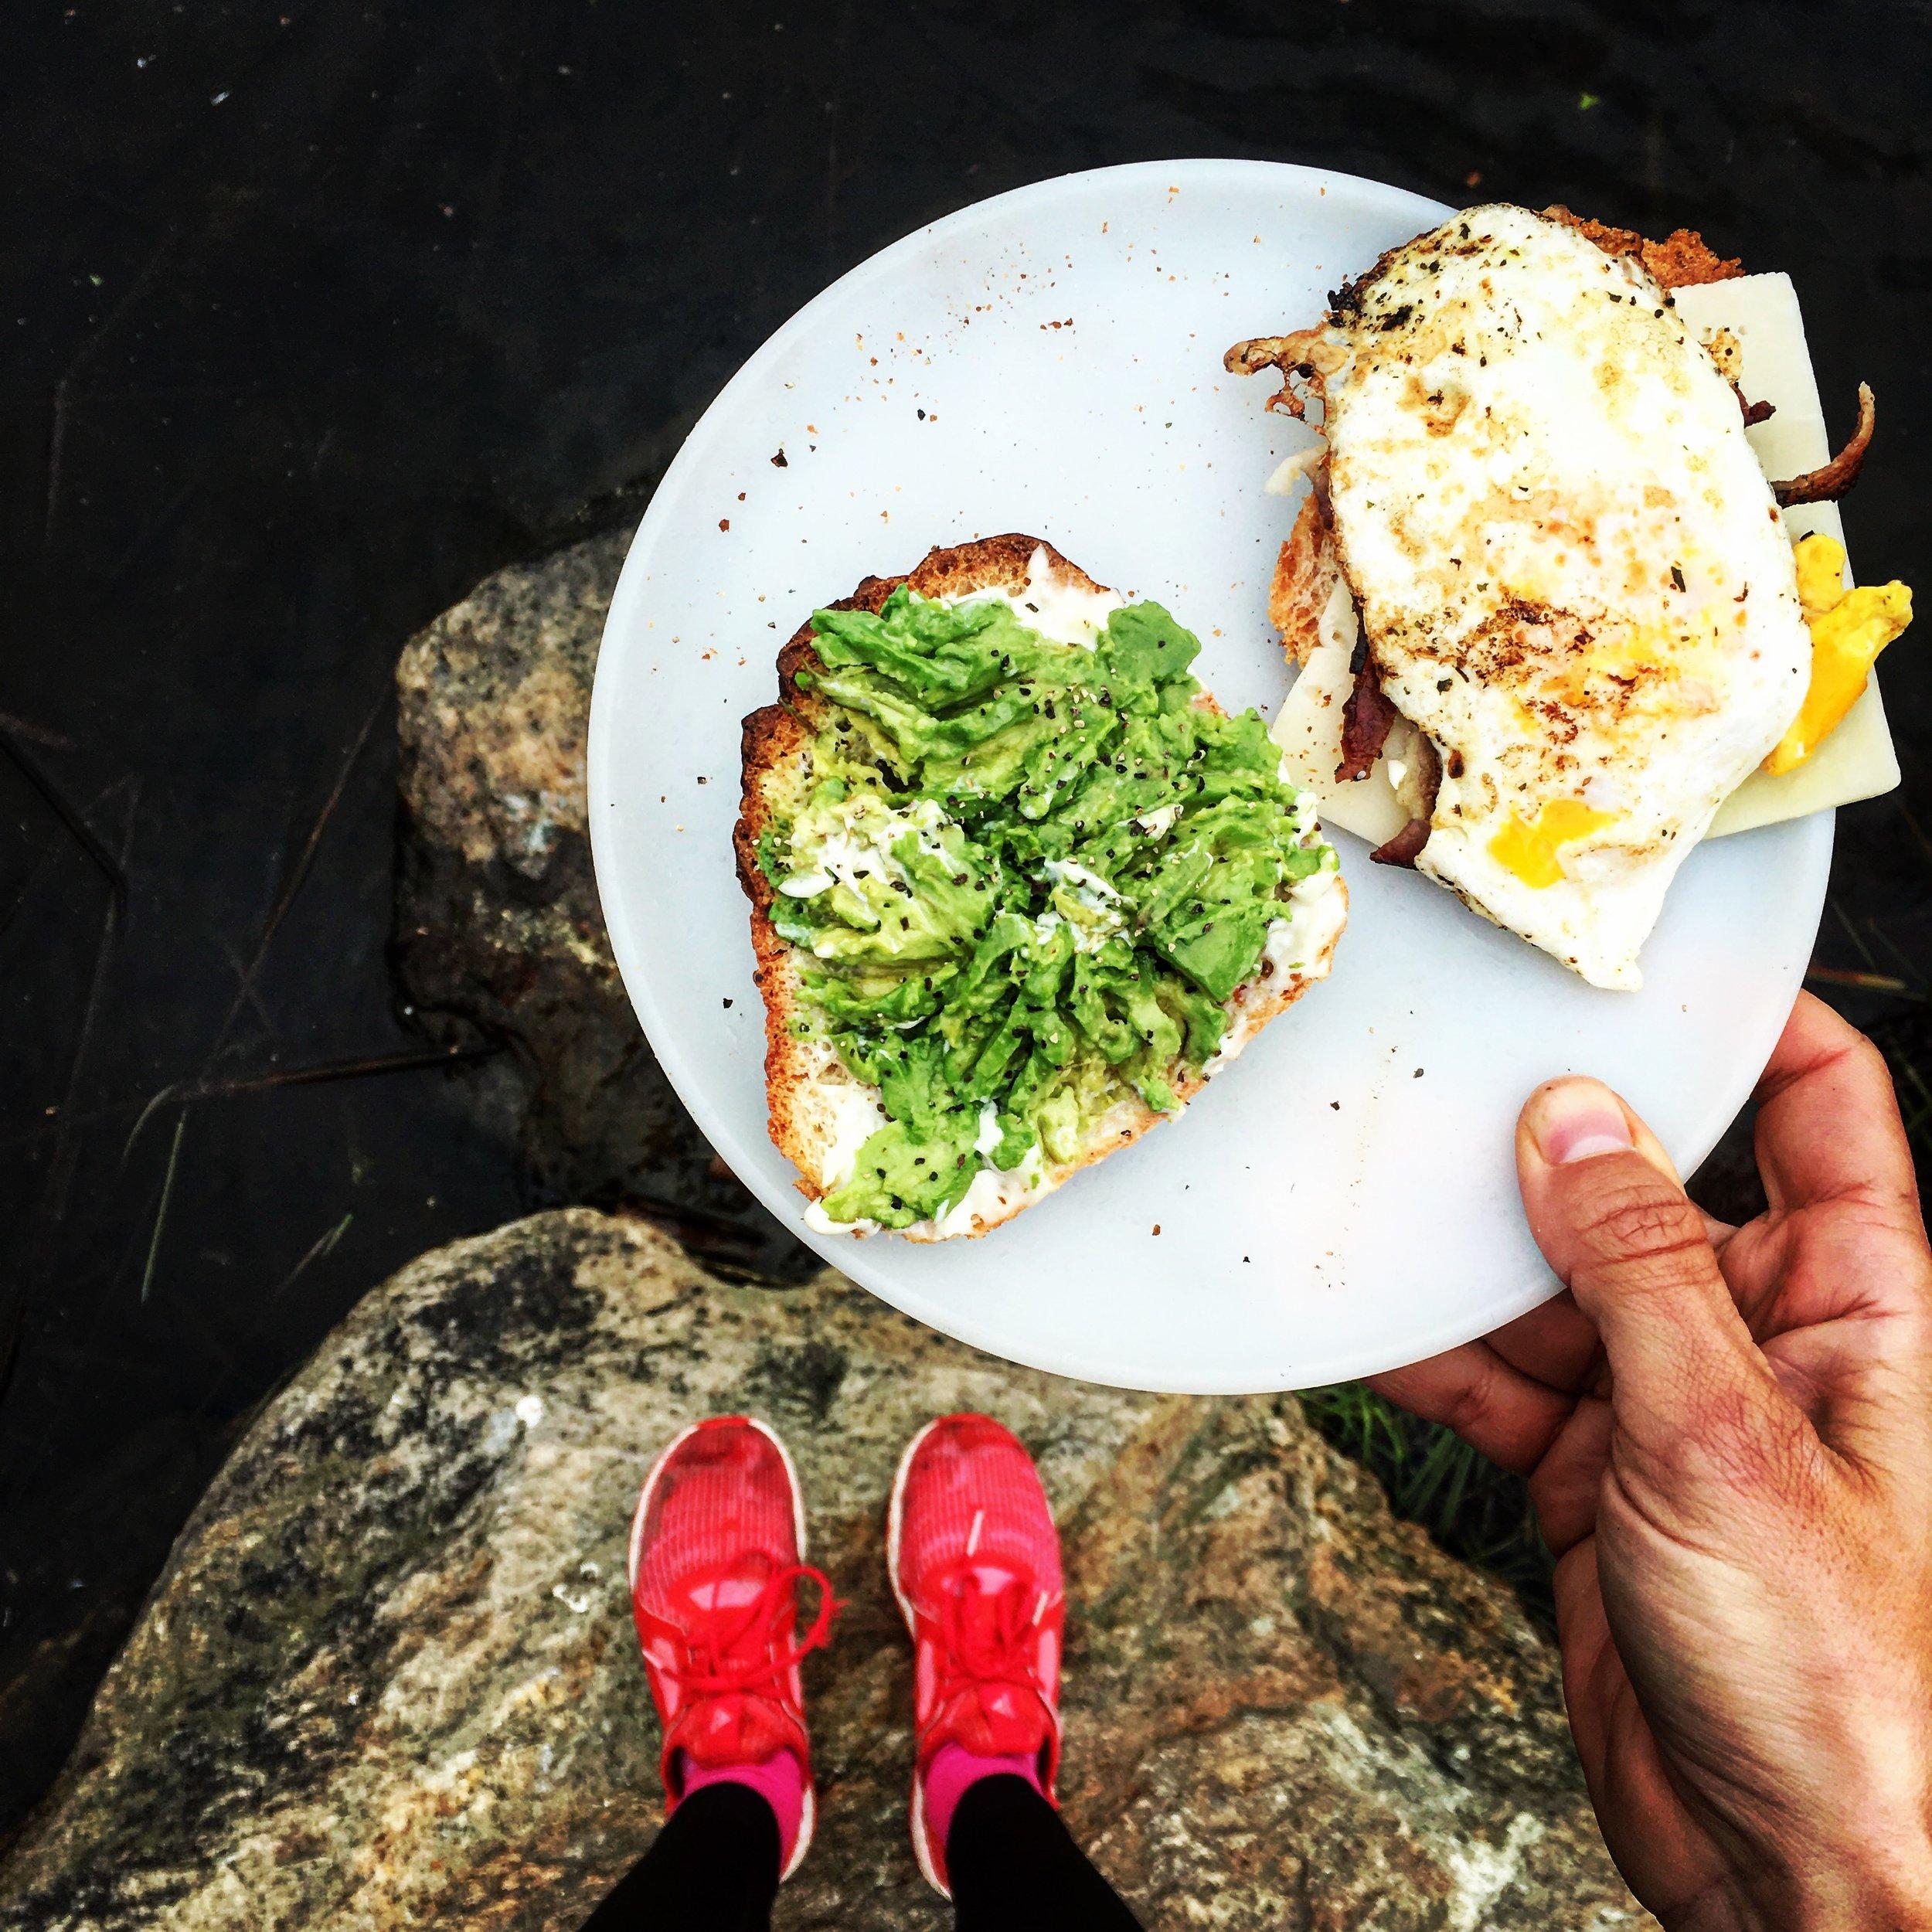 Avocado toast is camp friendly!